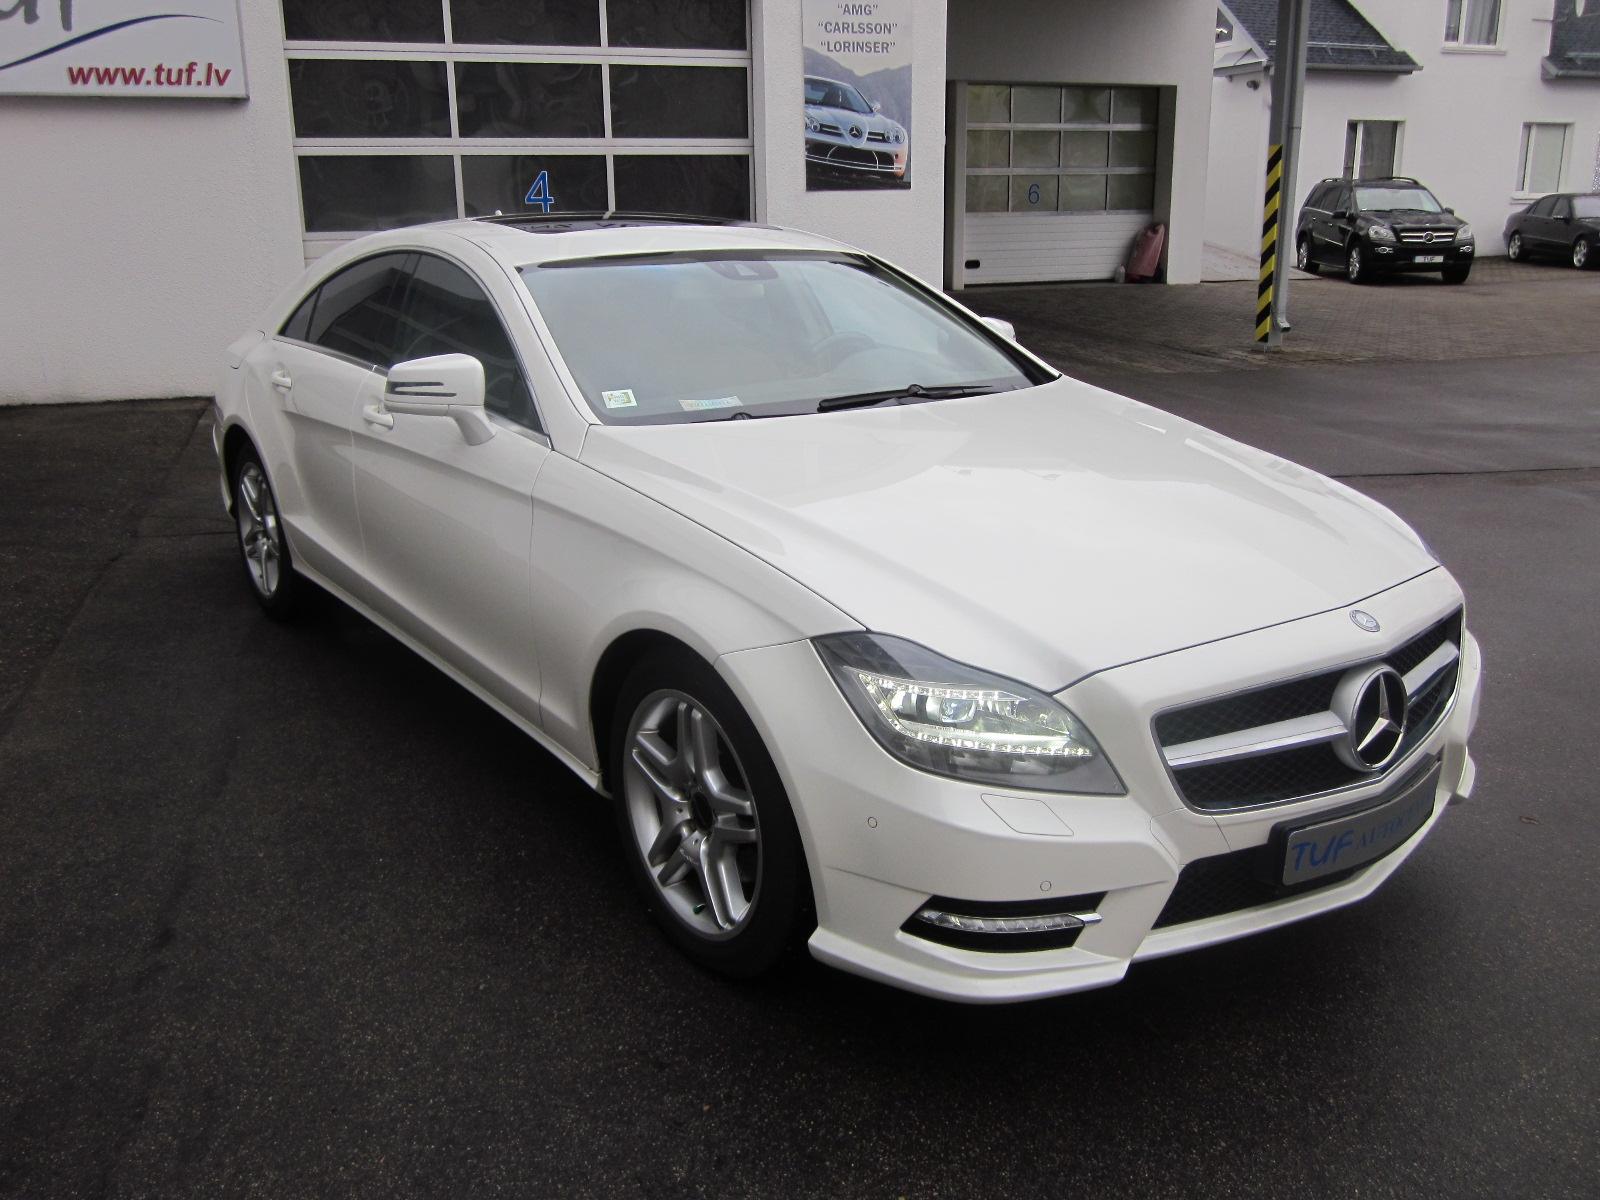 Mercedes benz cls 350 cdi amg tuf lv for Mercedes benz cl 240